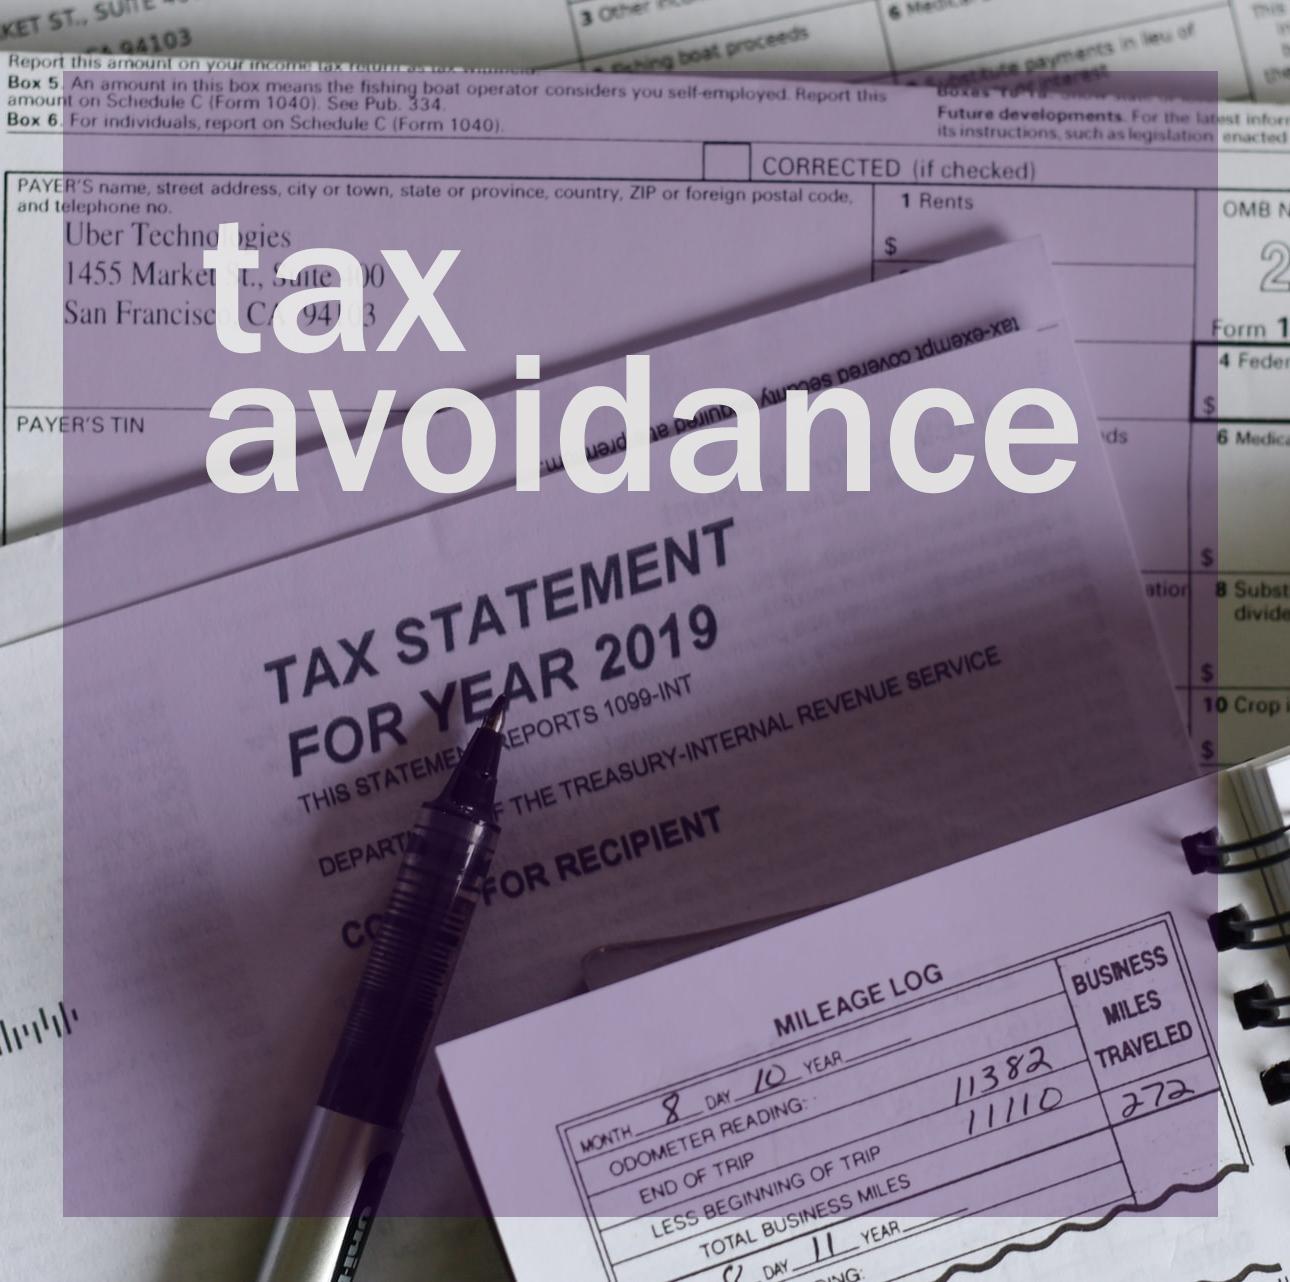 Tax Avoidance atau Penghindaran pajak